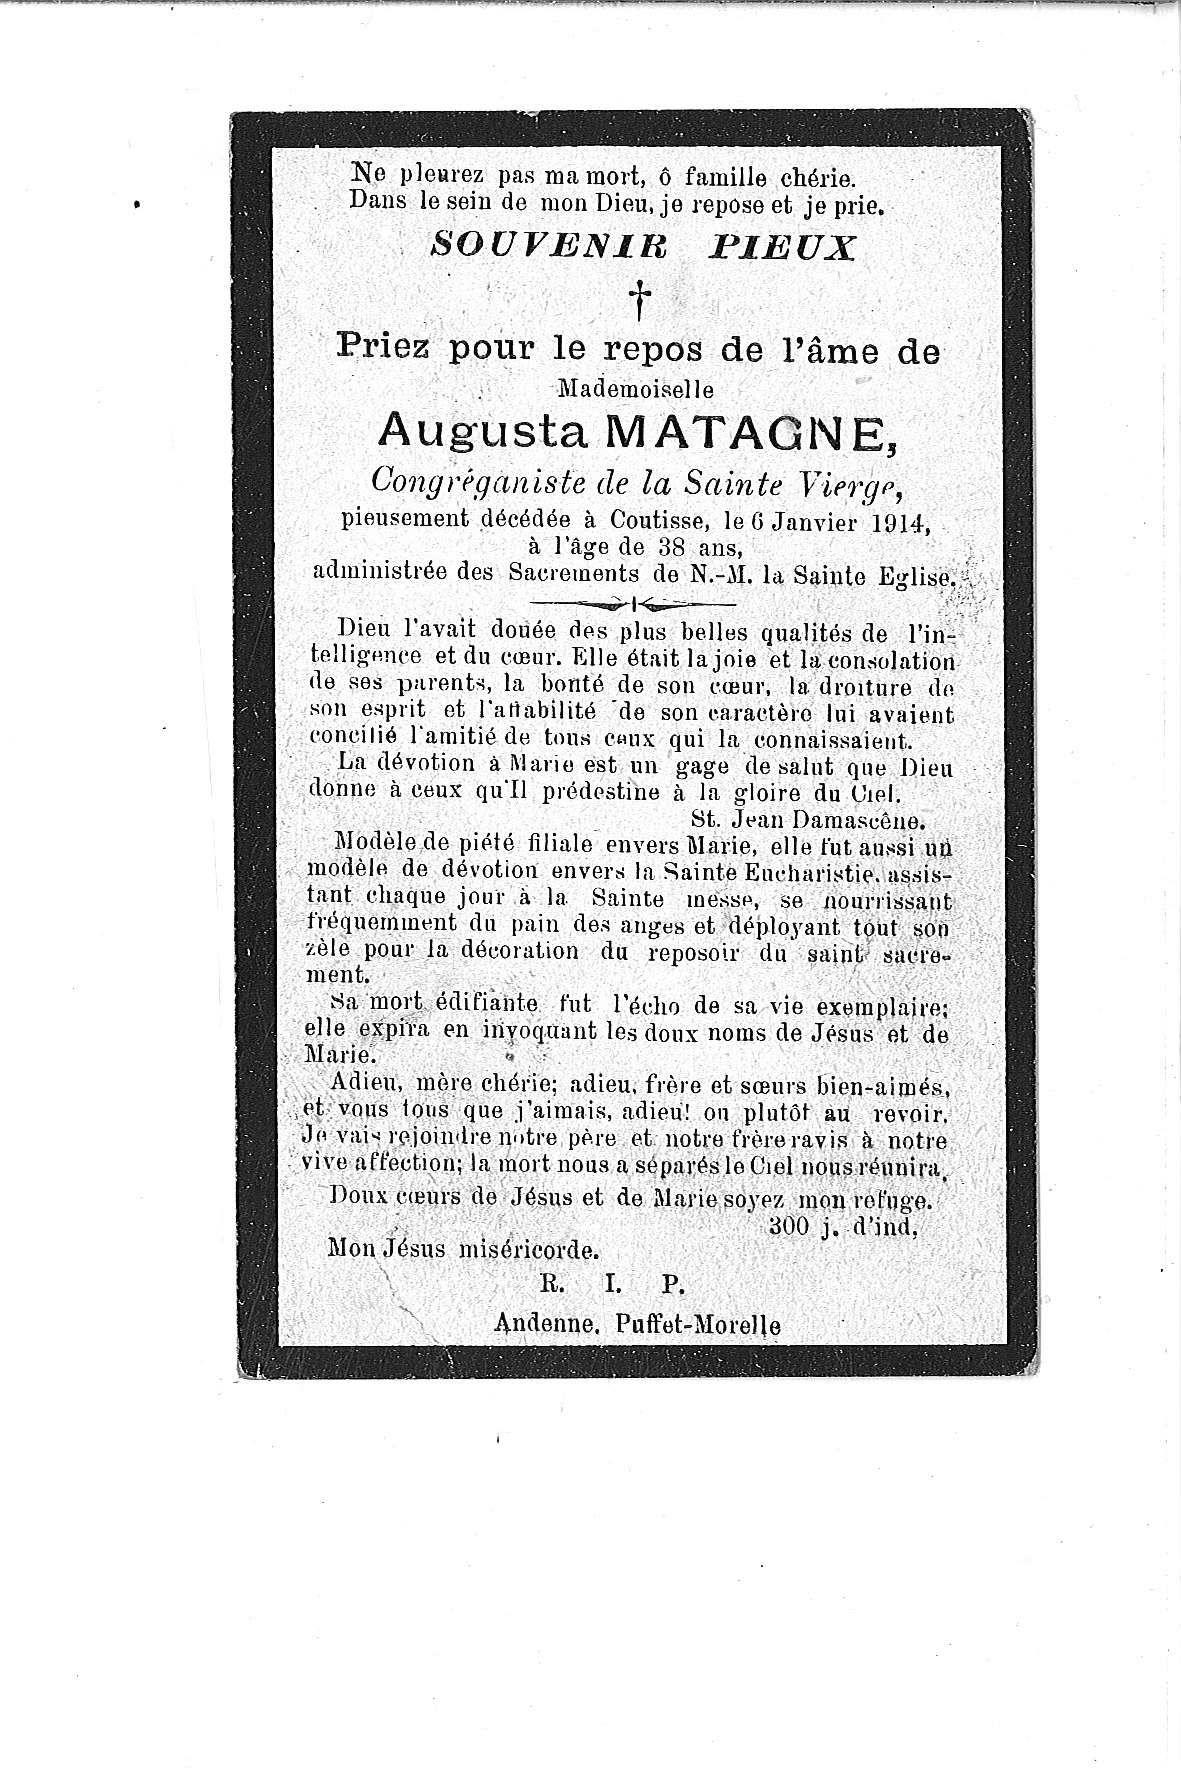 Augusta(1914)20120412120820_00003.jpg